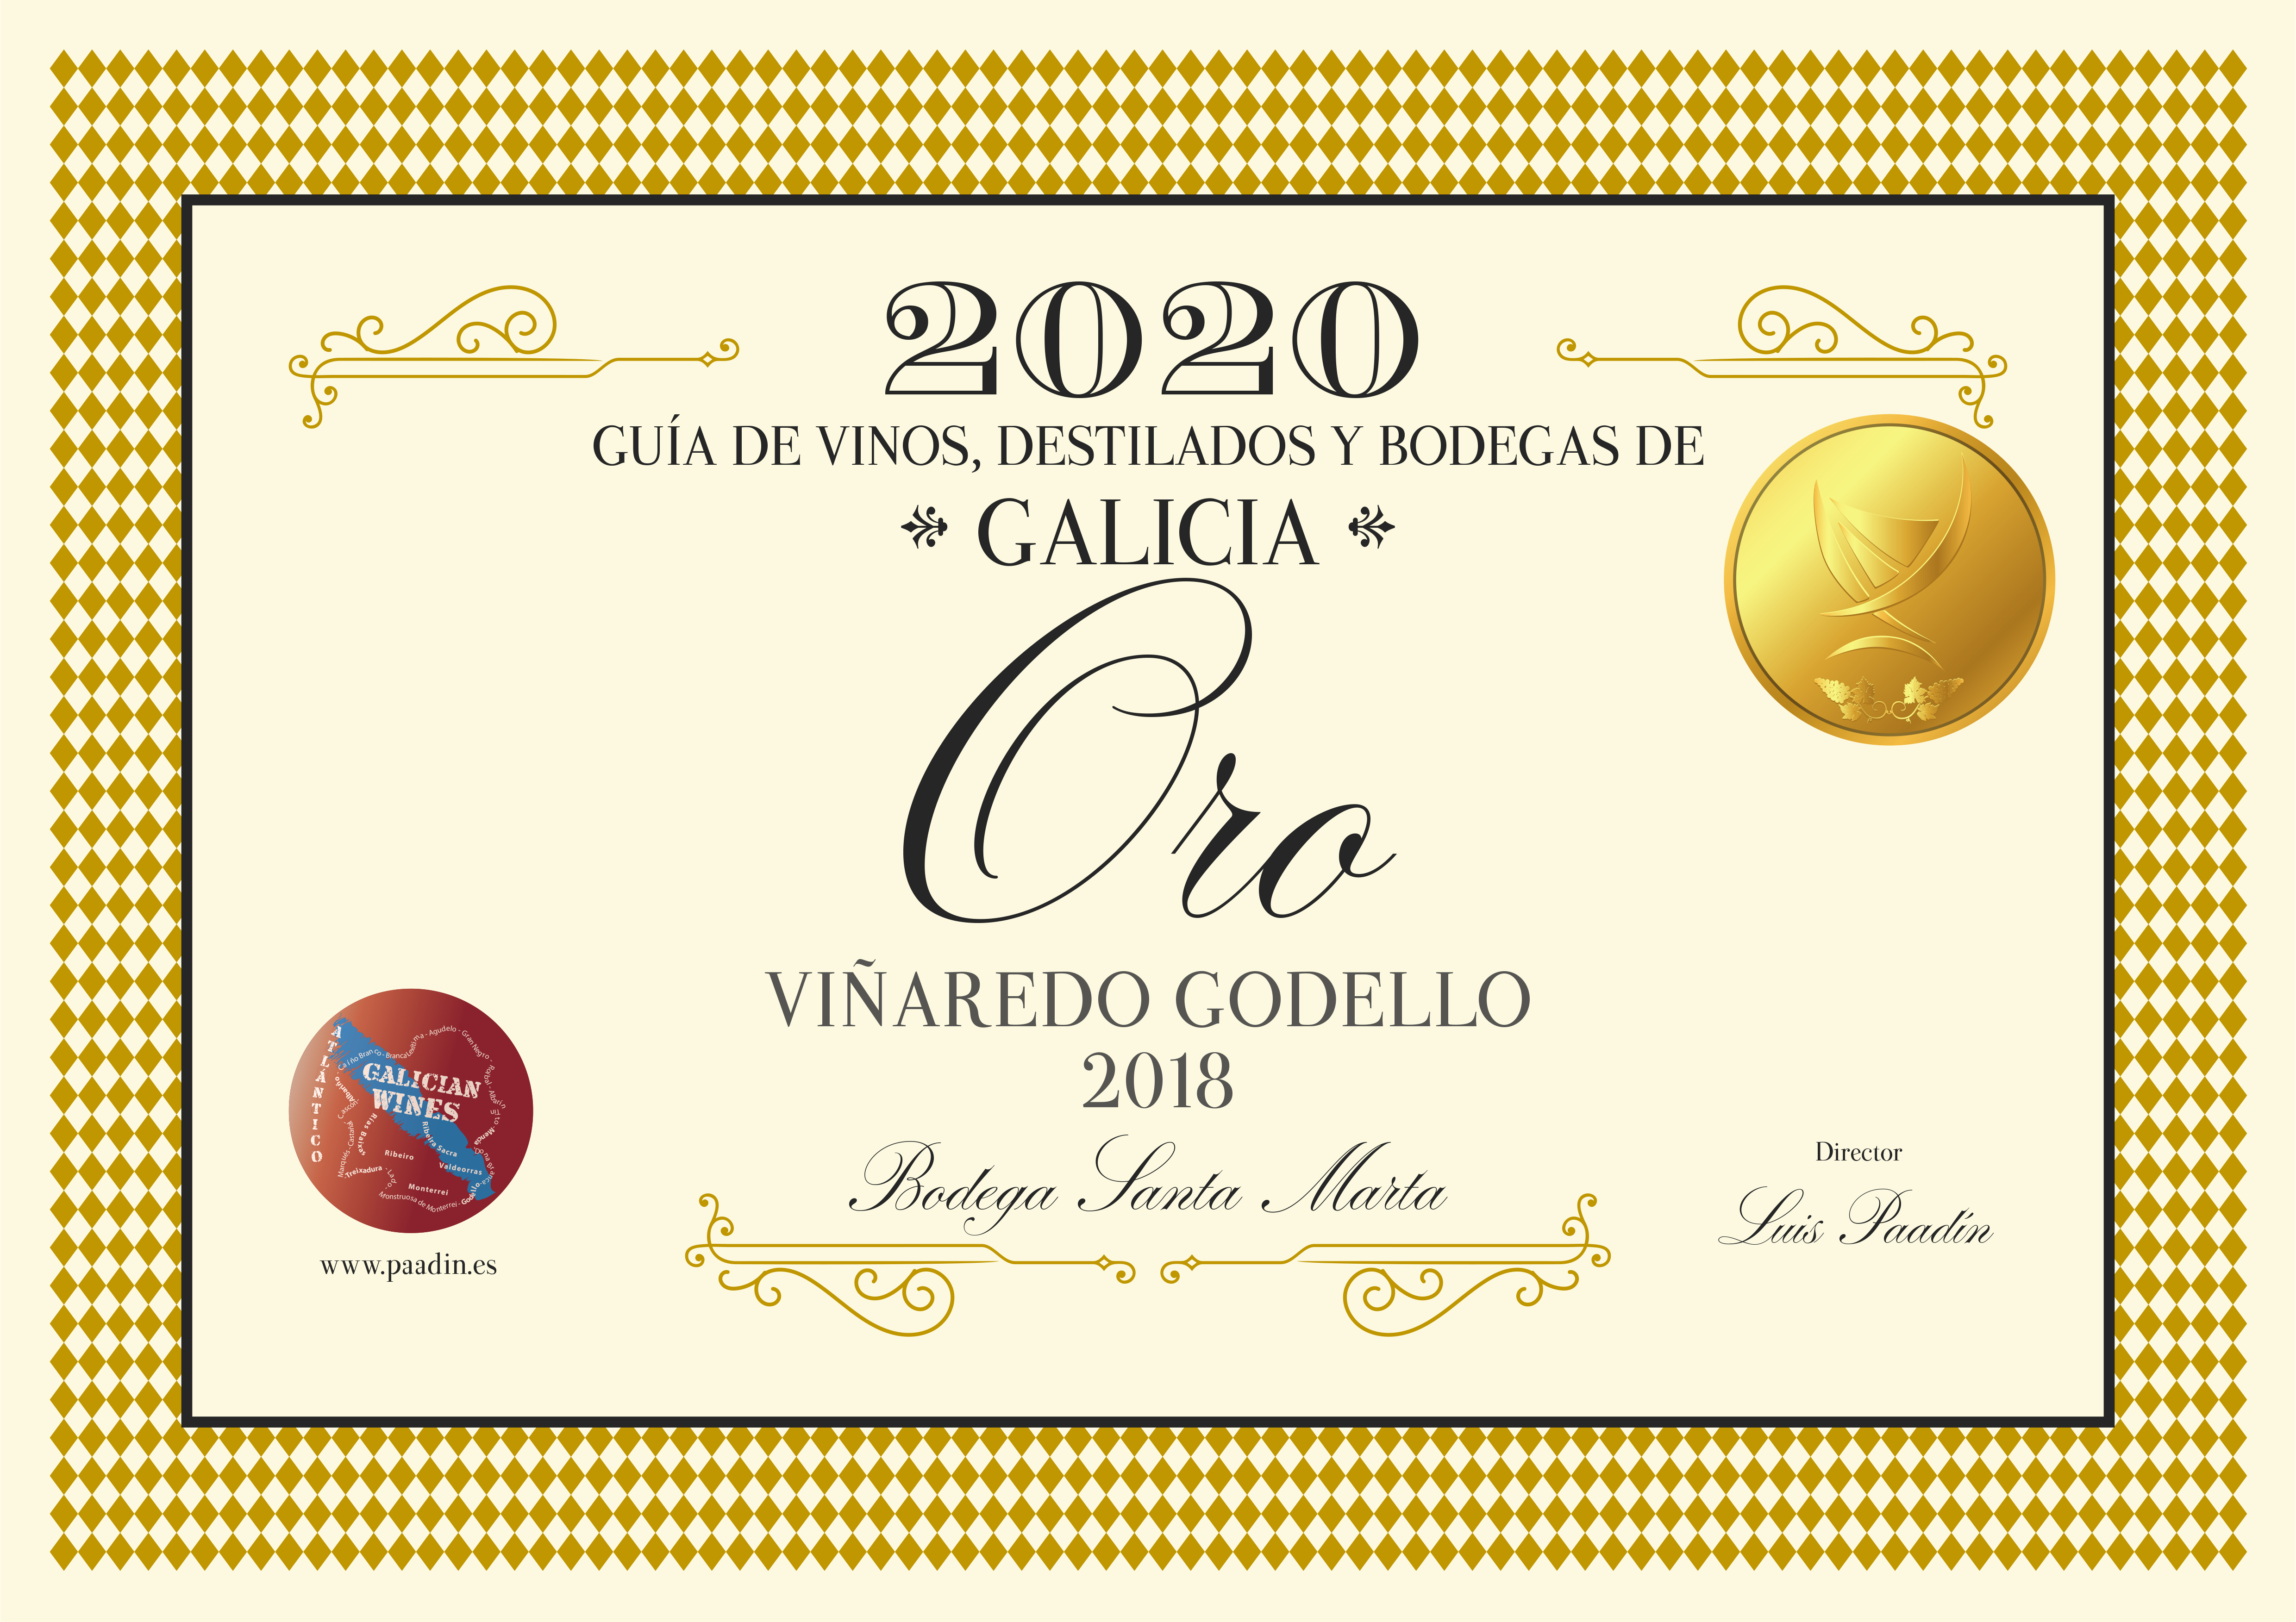 ORO GODELLO GUIA 2020